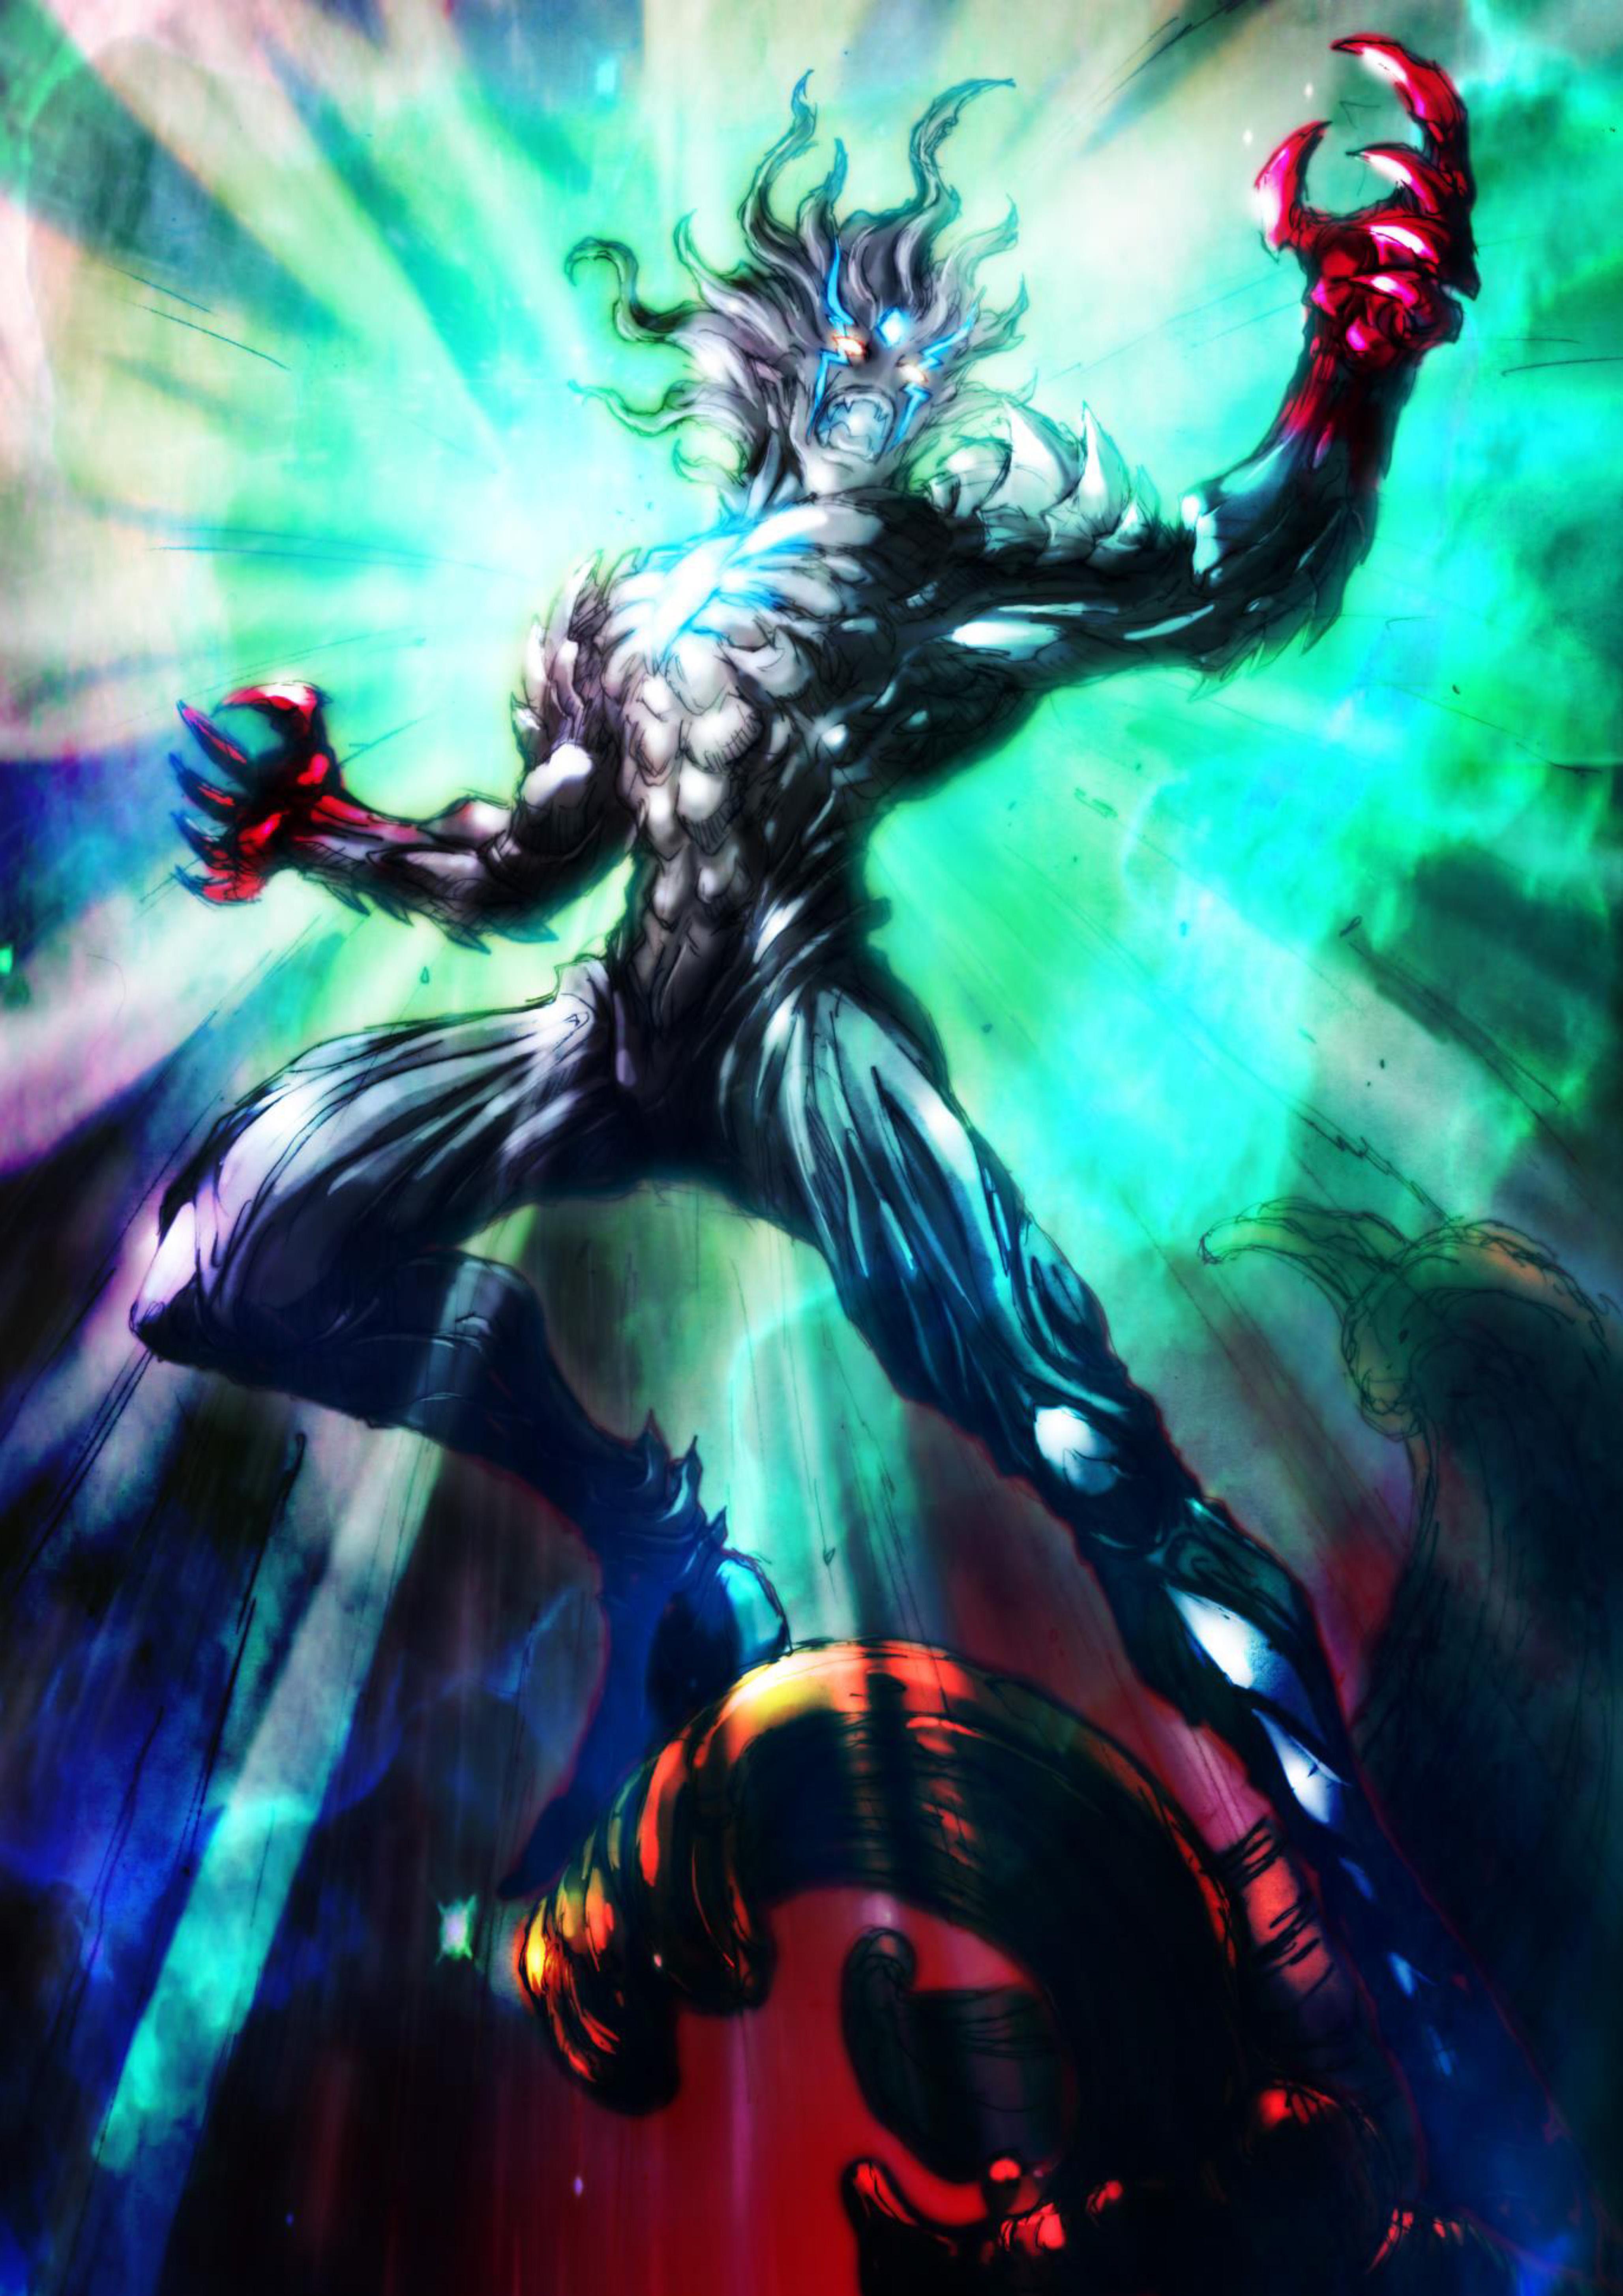 Ultraman: Another Genesis